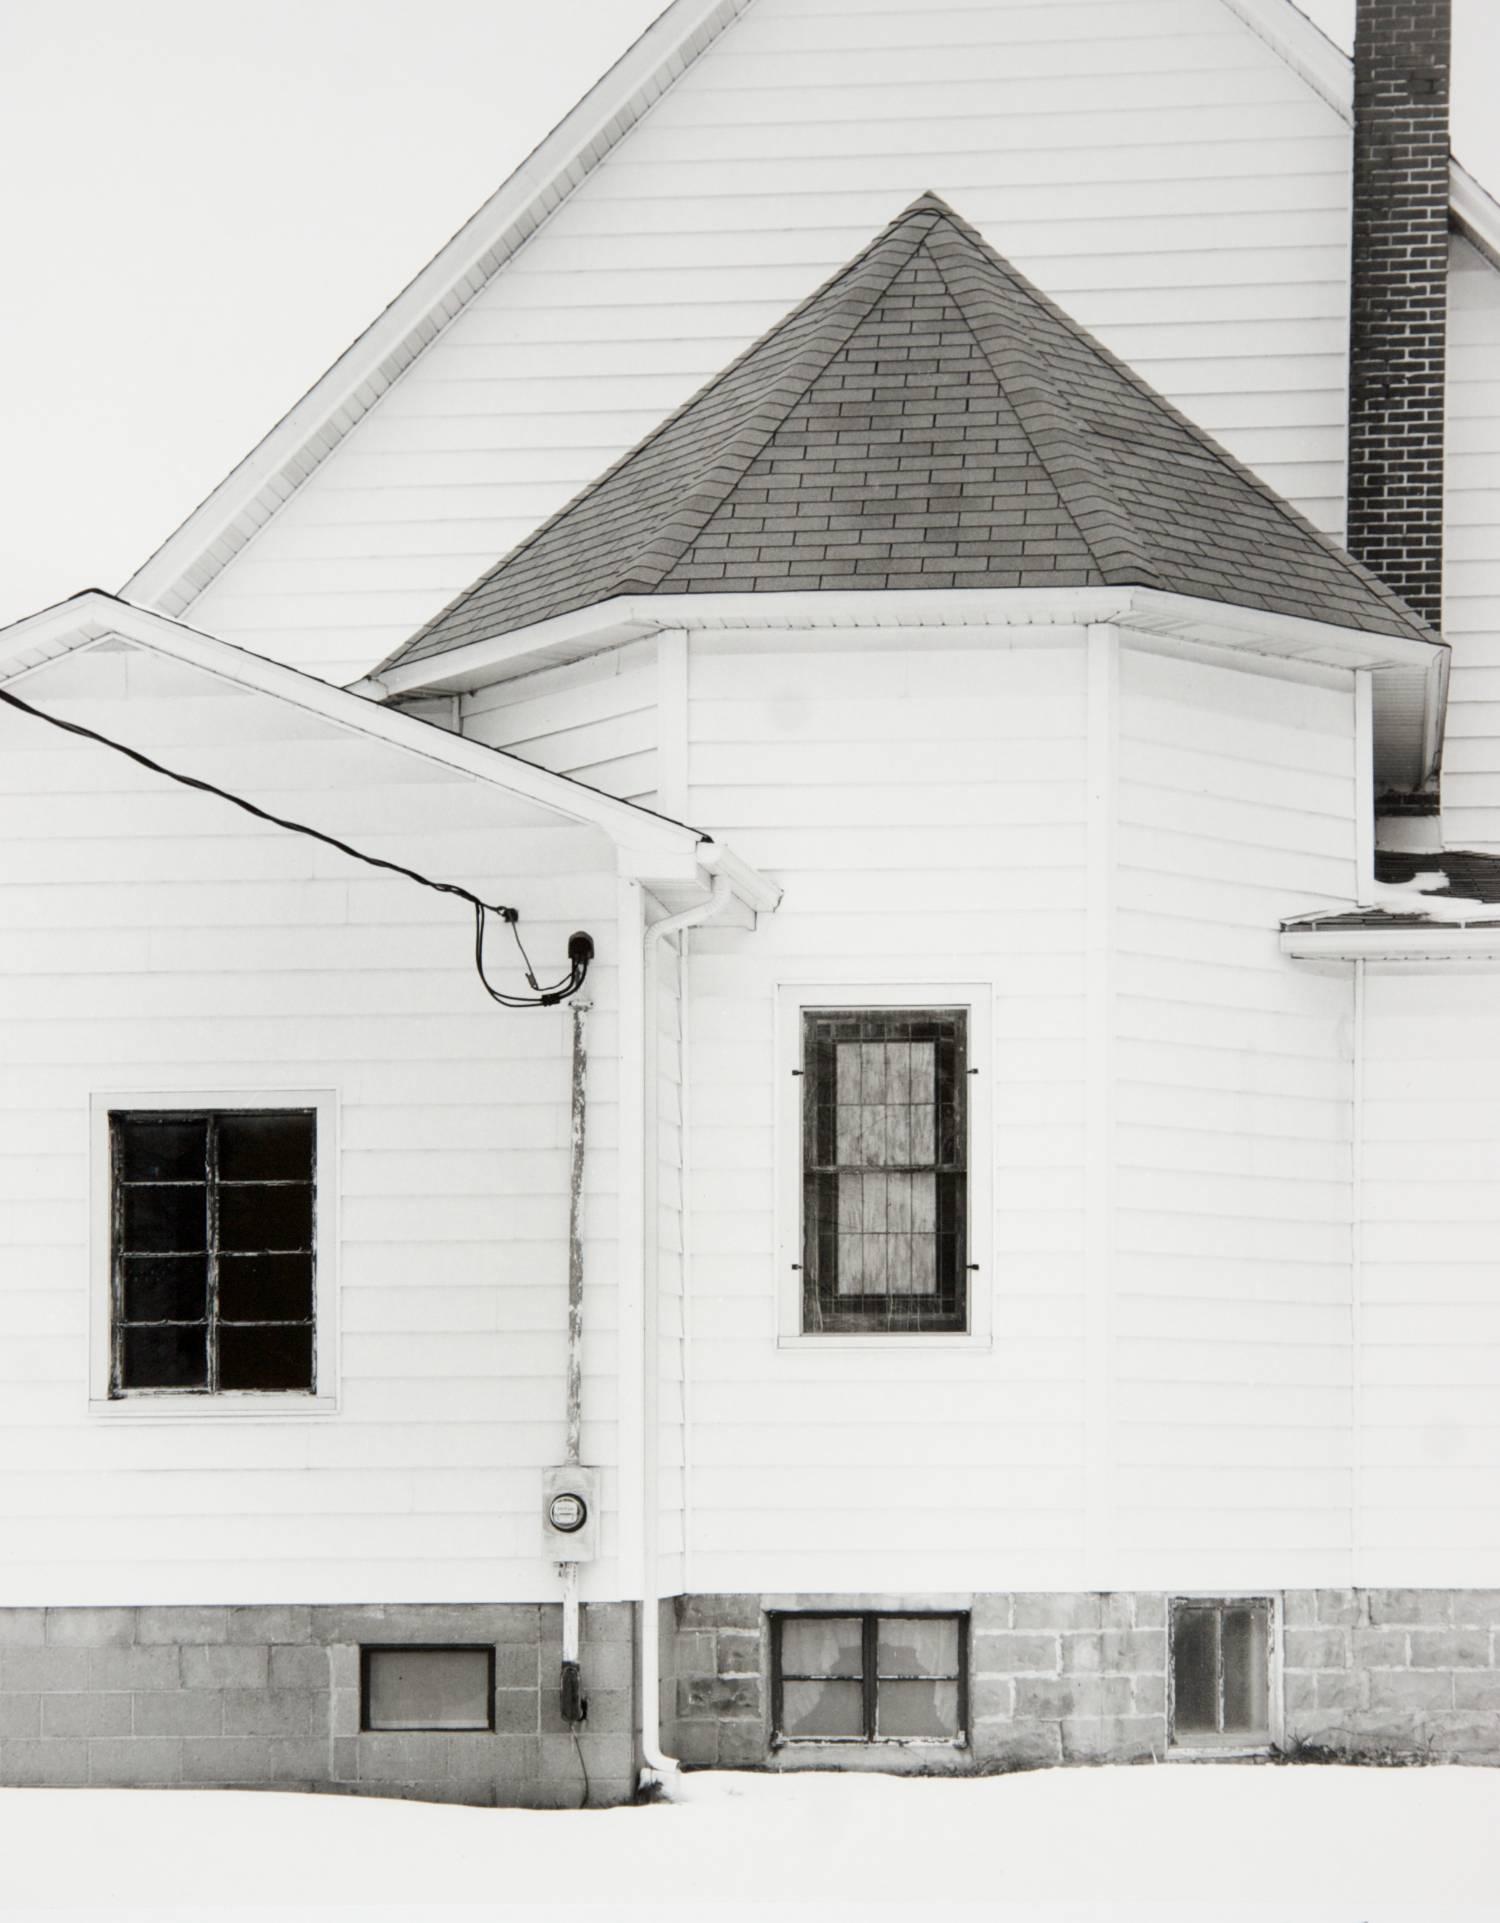 Church in Winter (Bowler, Wisconsin)